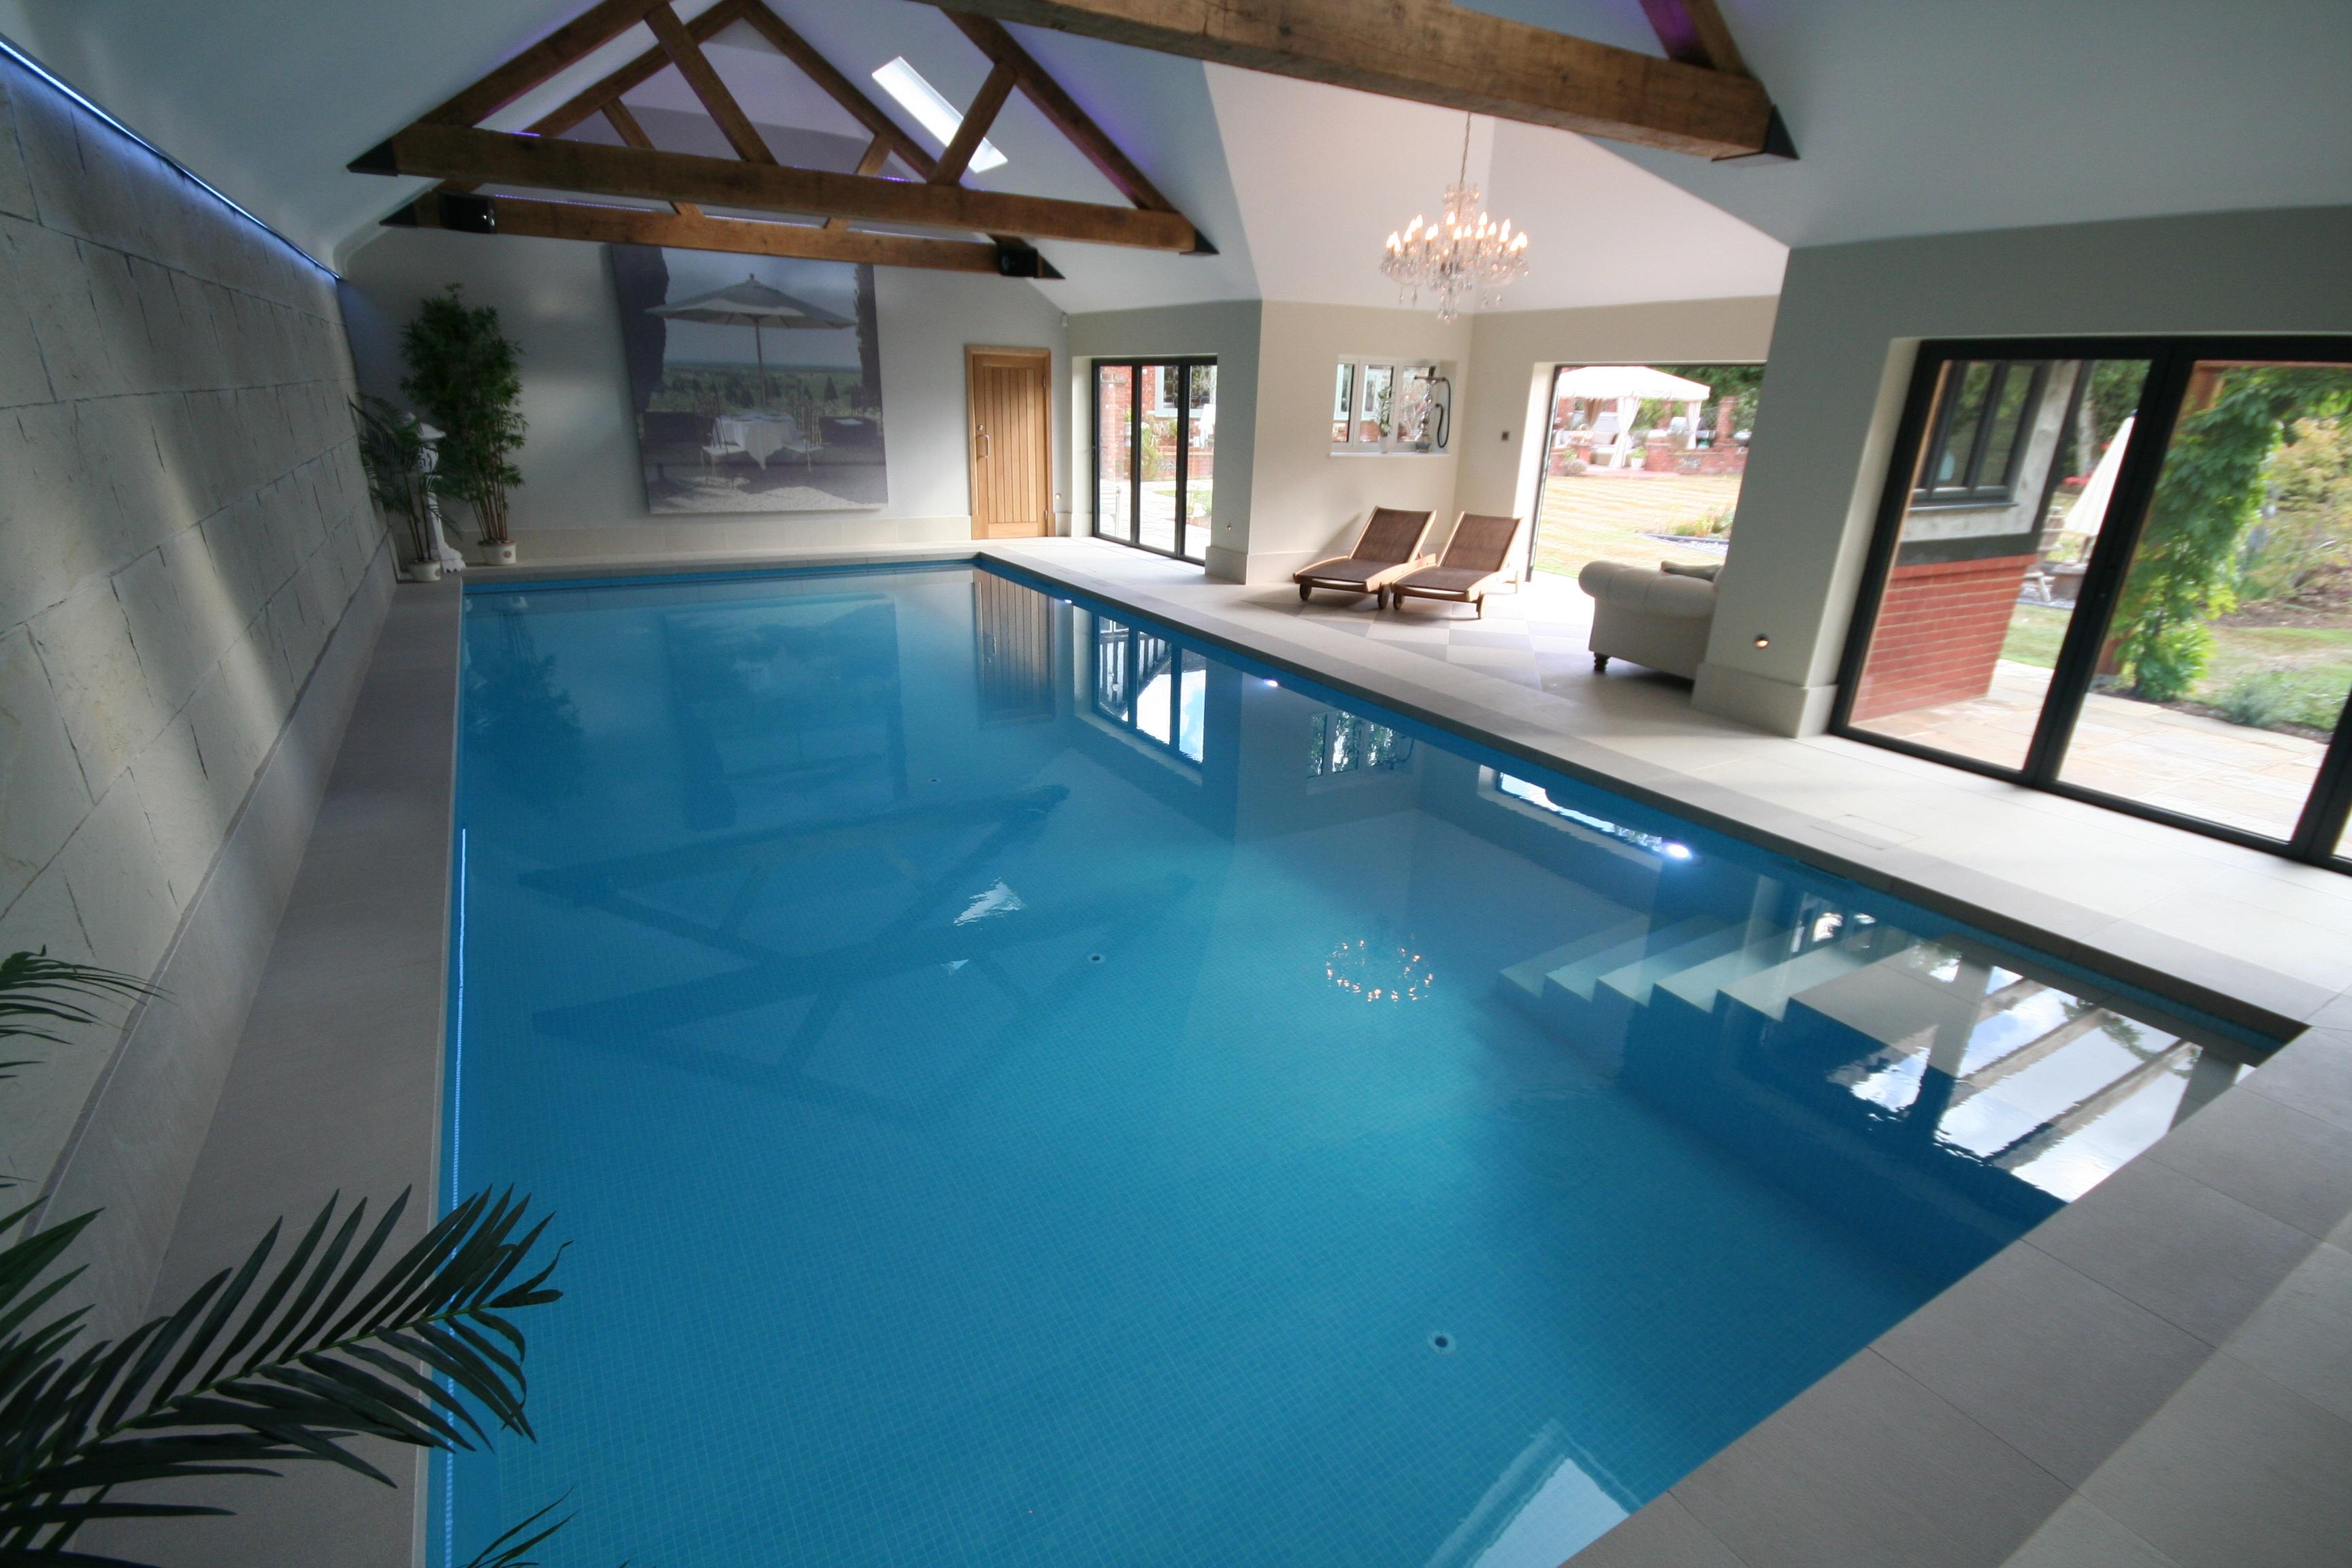 Award winning indoor pools - Tanby Pools Ltd